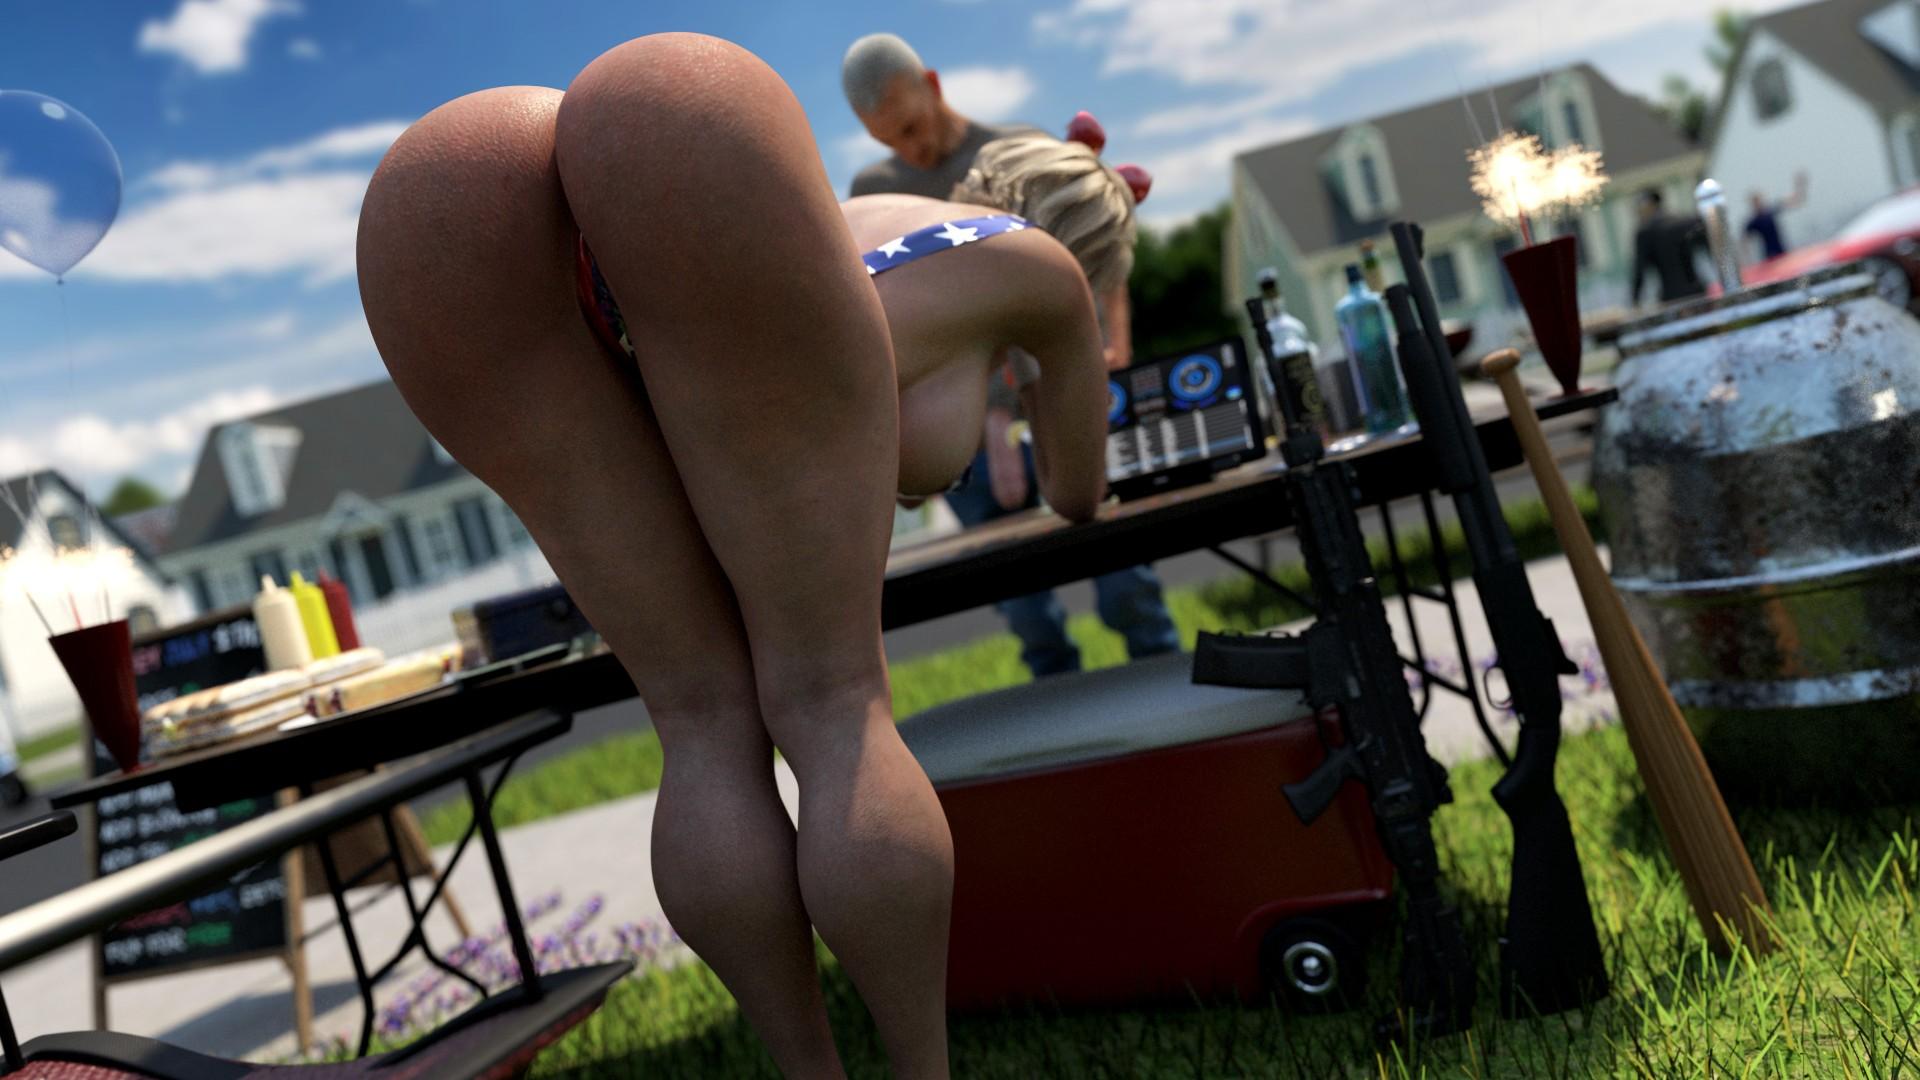 porn movie techn iques